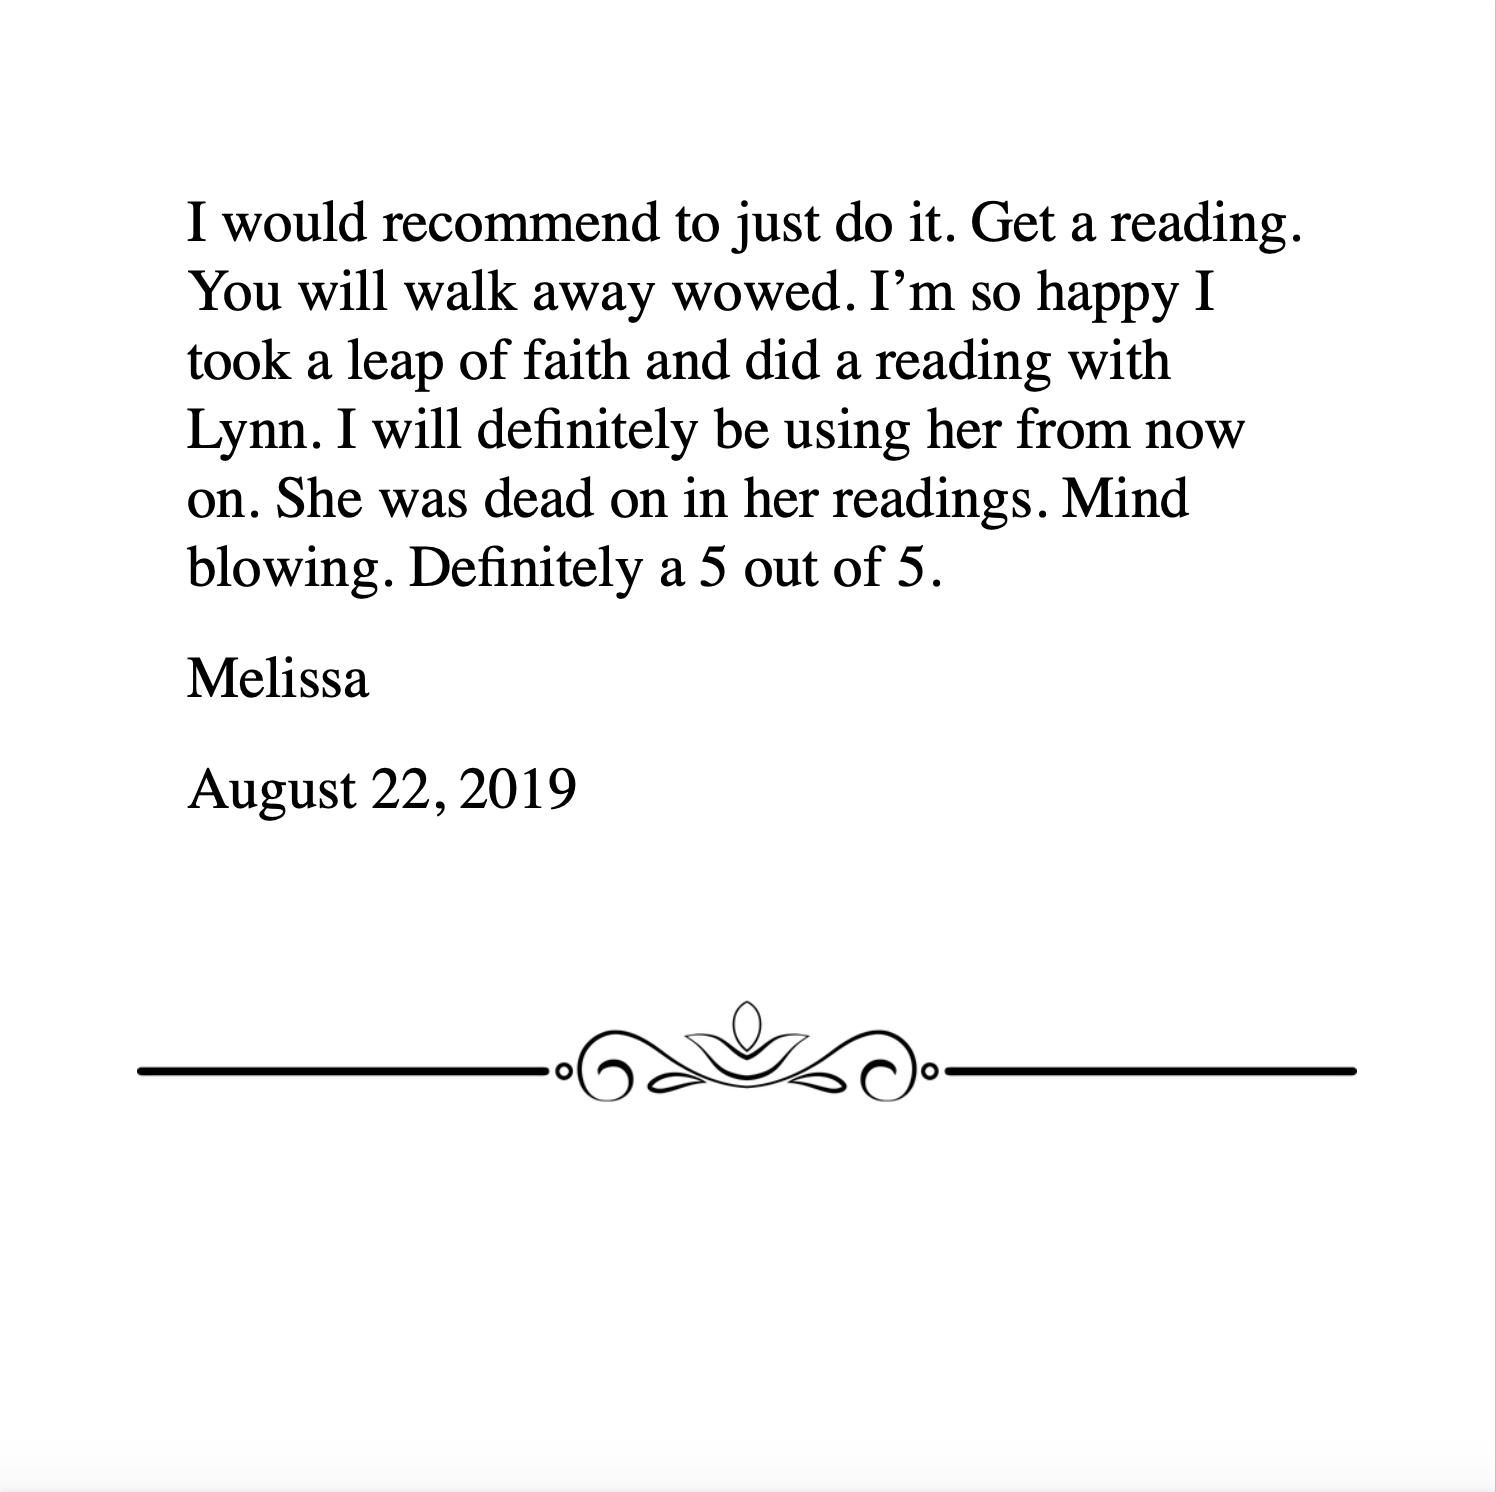 Melissa 8.22.2019